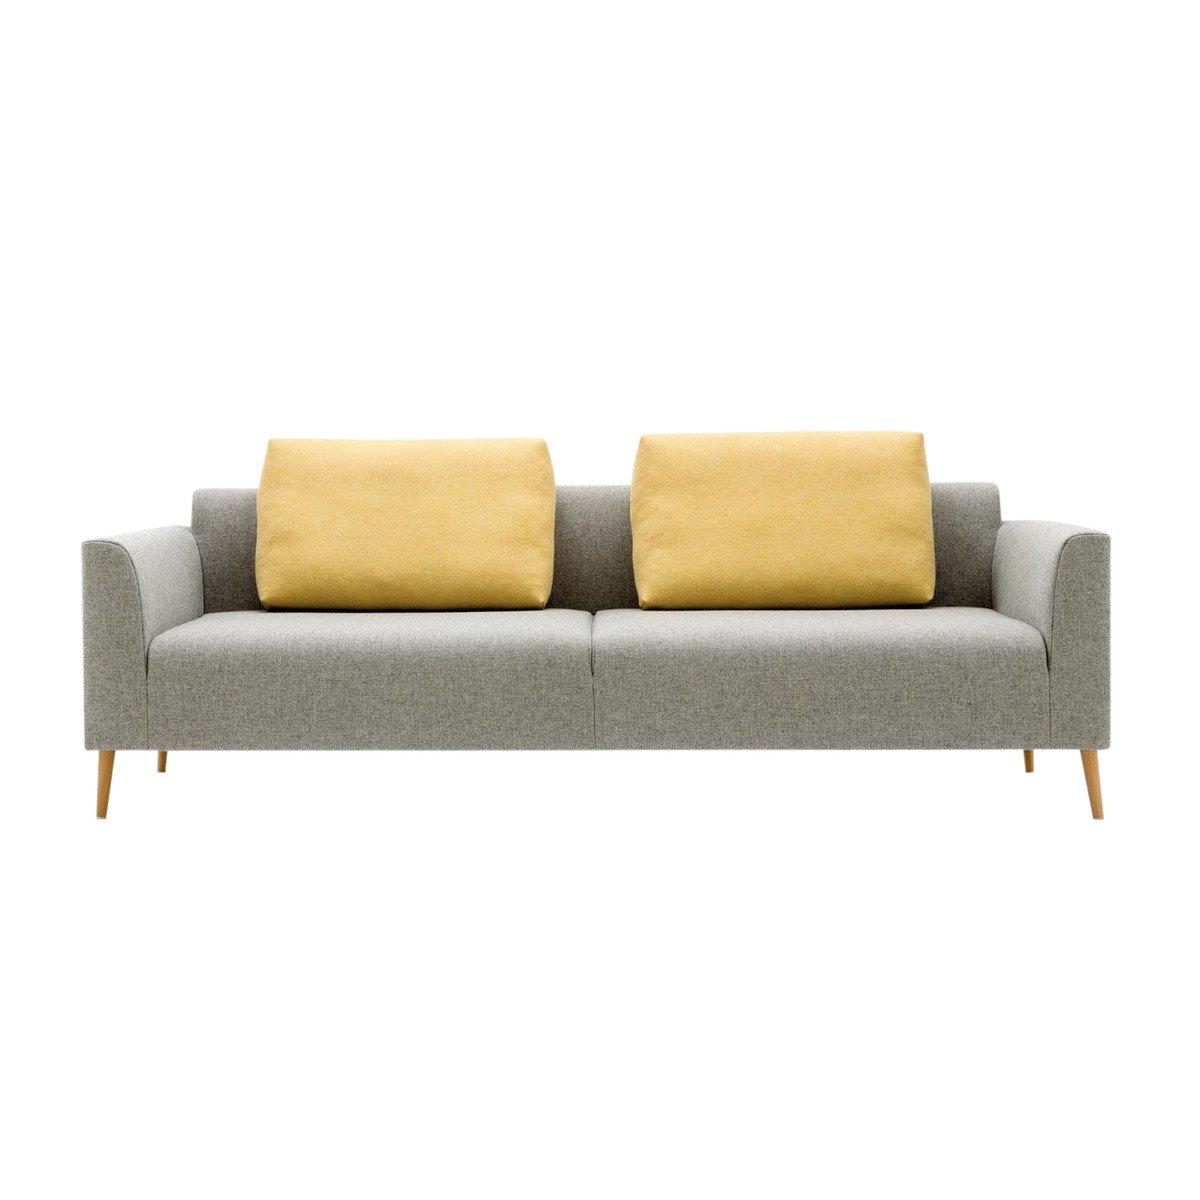 freistil 162 3-Seater Sofa | freistil Rolf Benz | AmbienteDirect.com